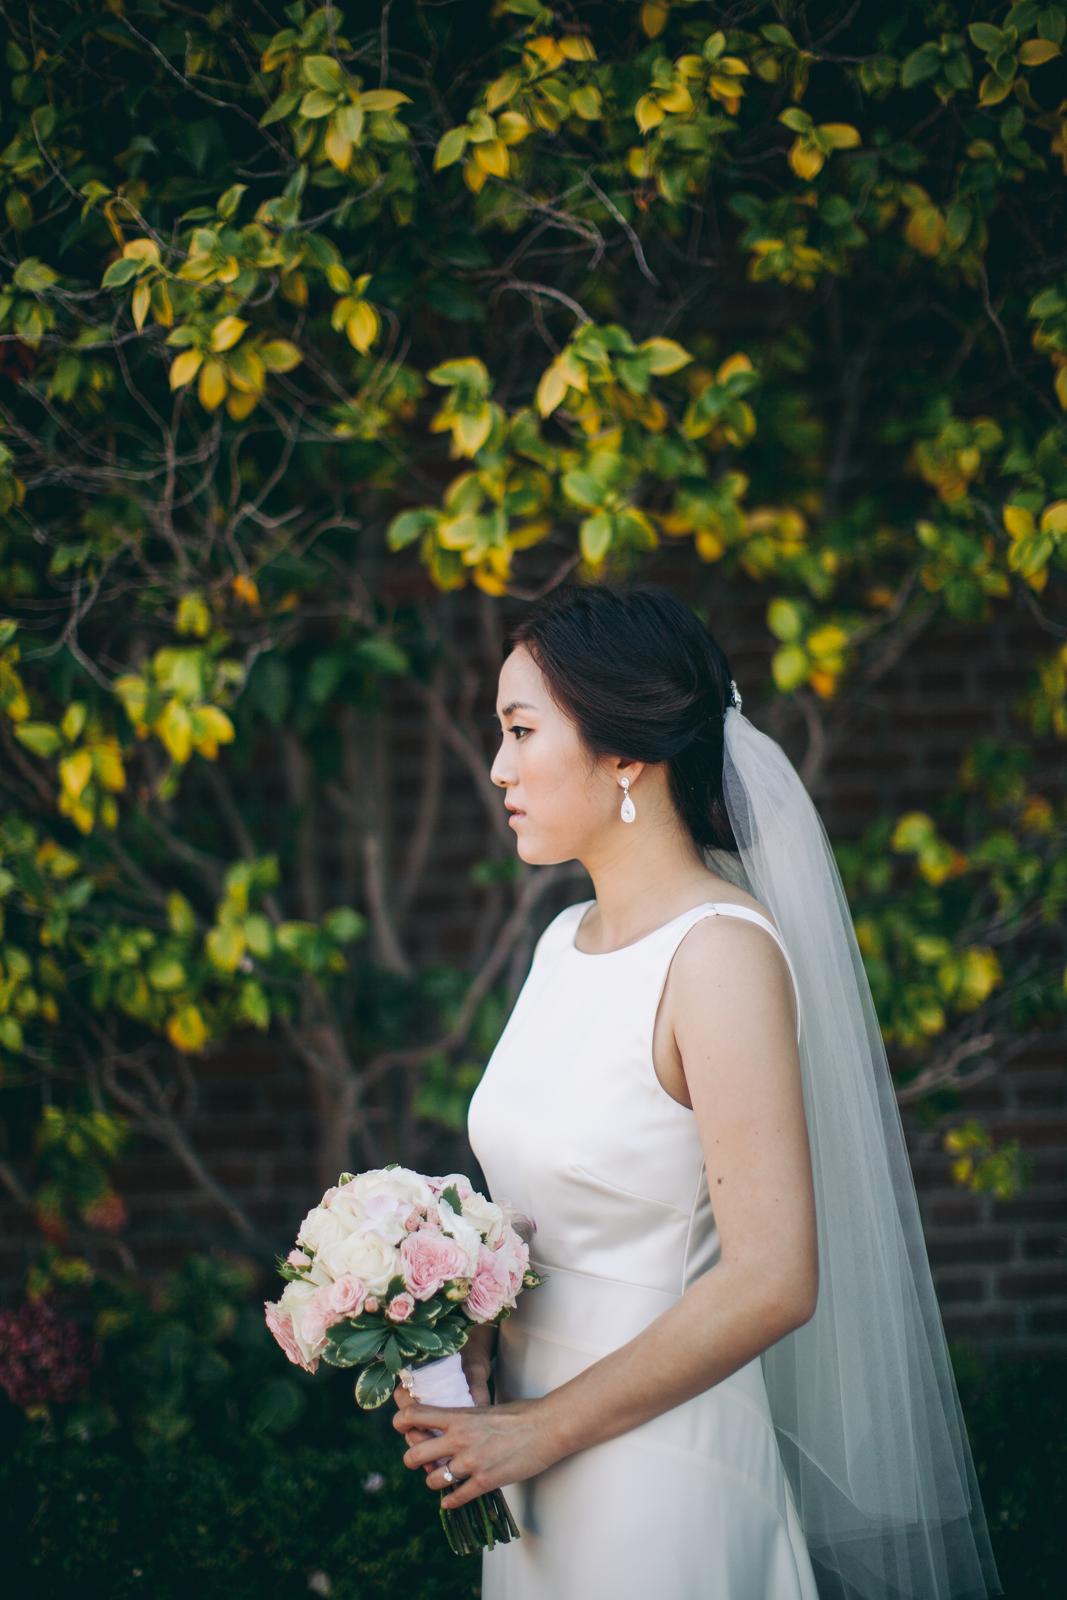 kohl_manison_wedding_photography_sarah_eric_ebony_siovhan_bokeh_photography_034.jpg